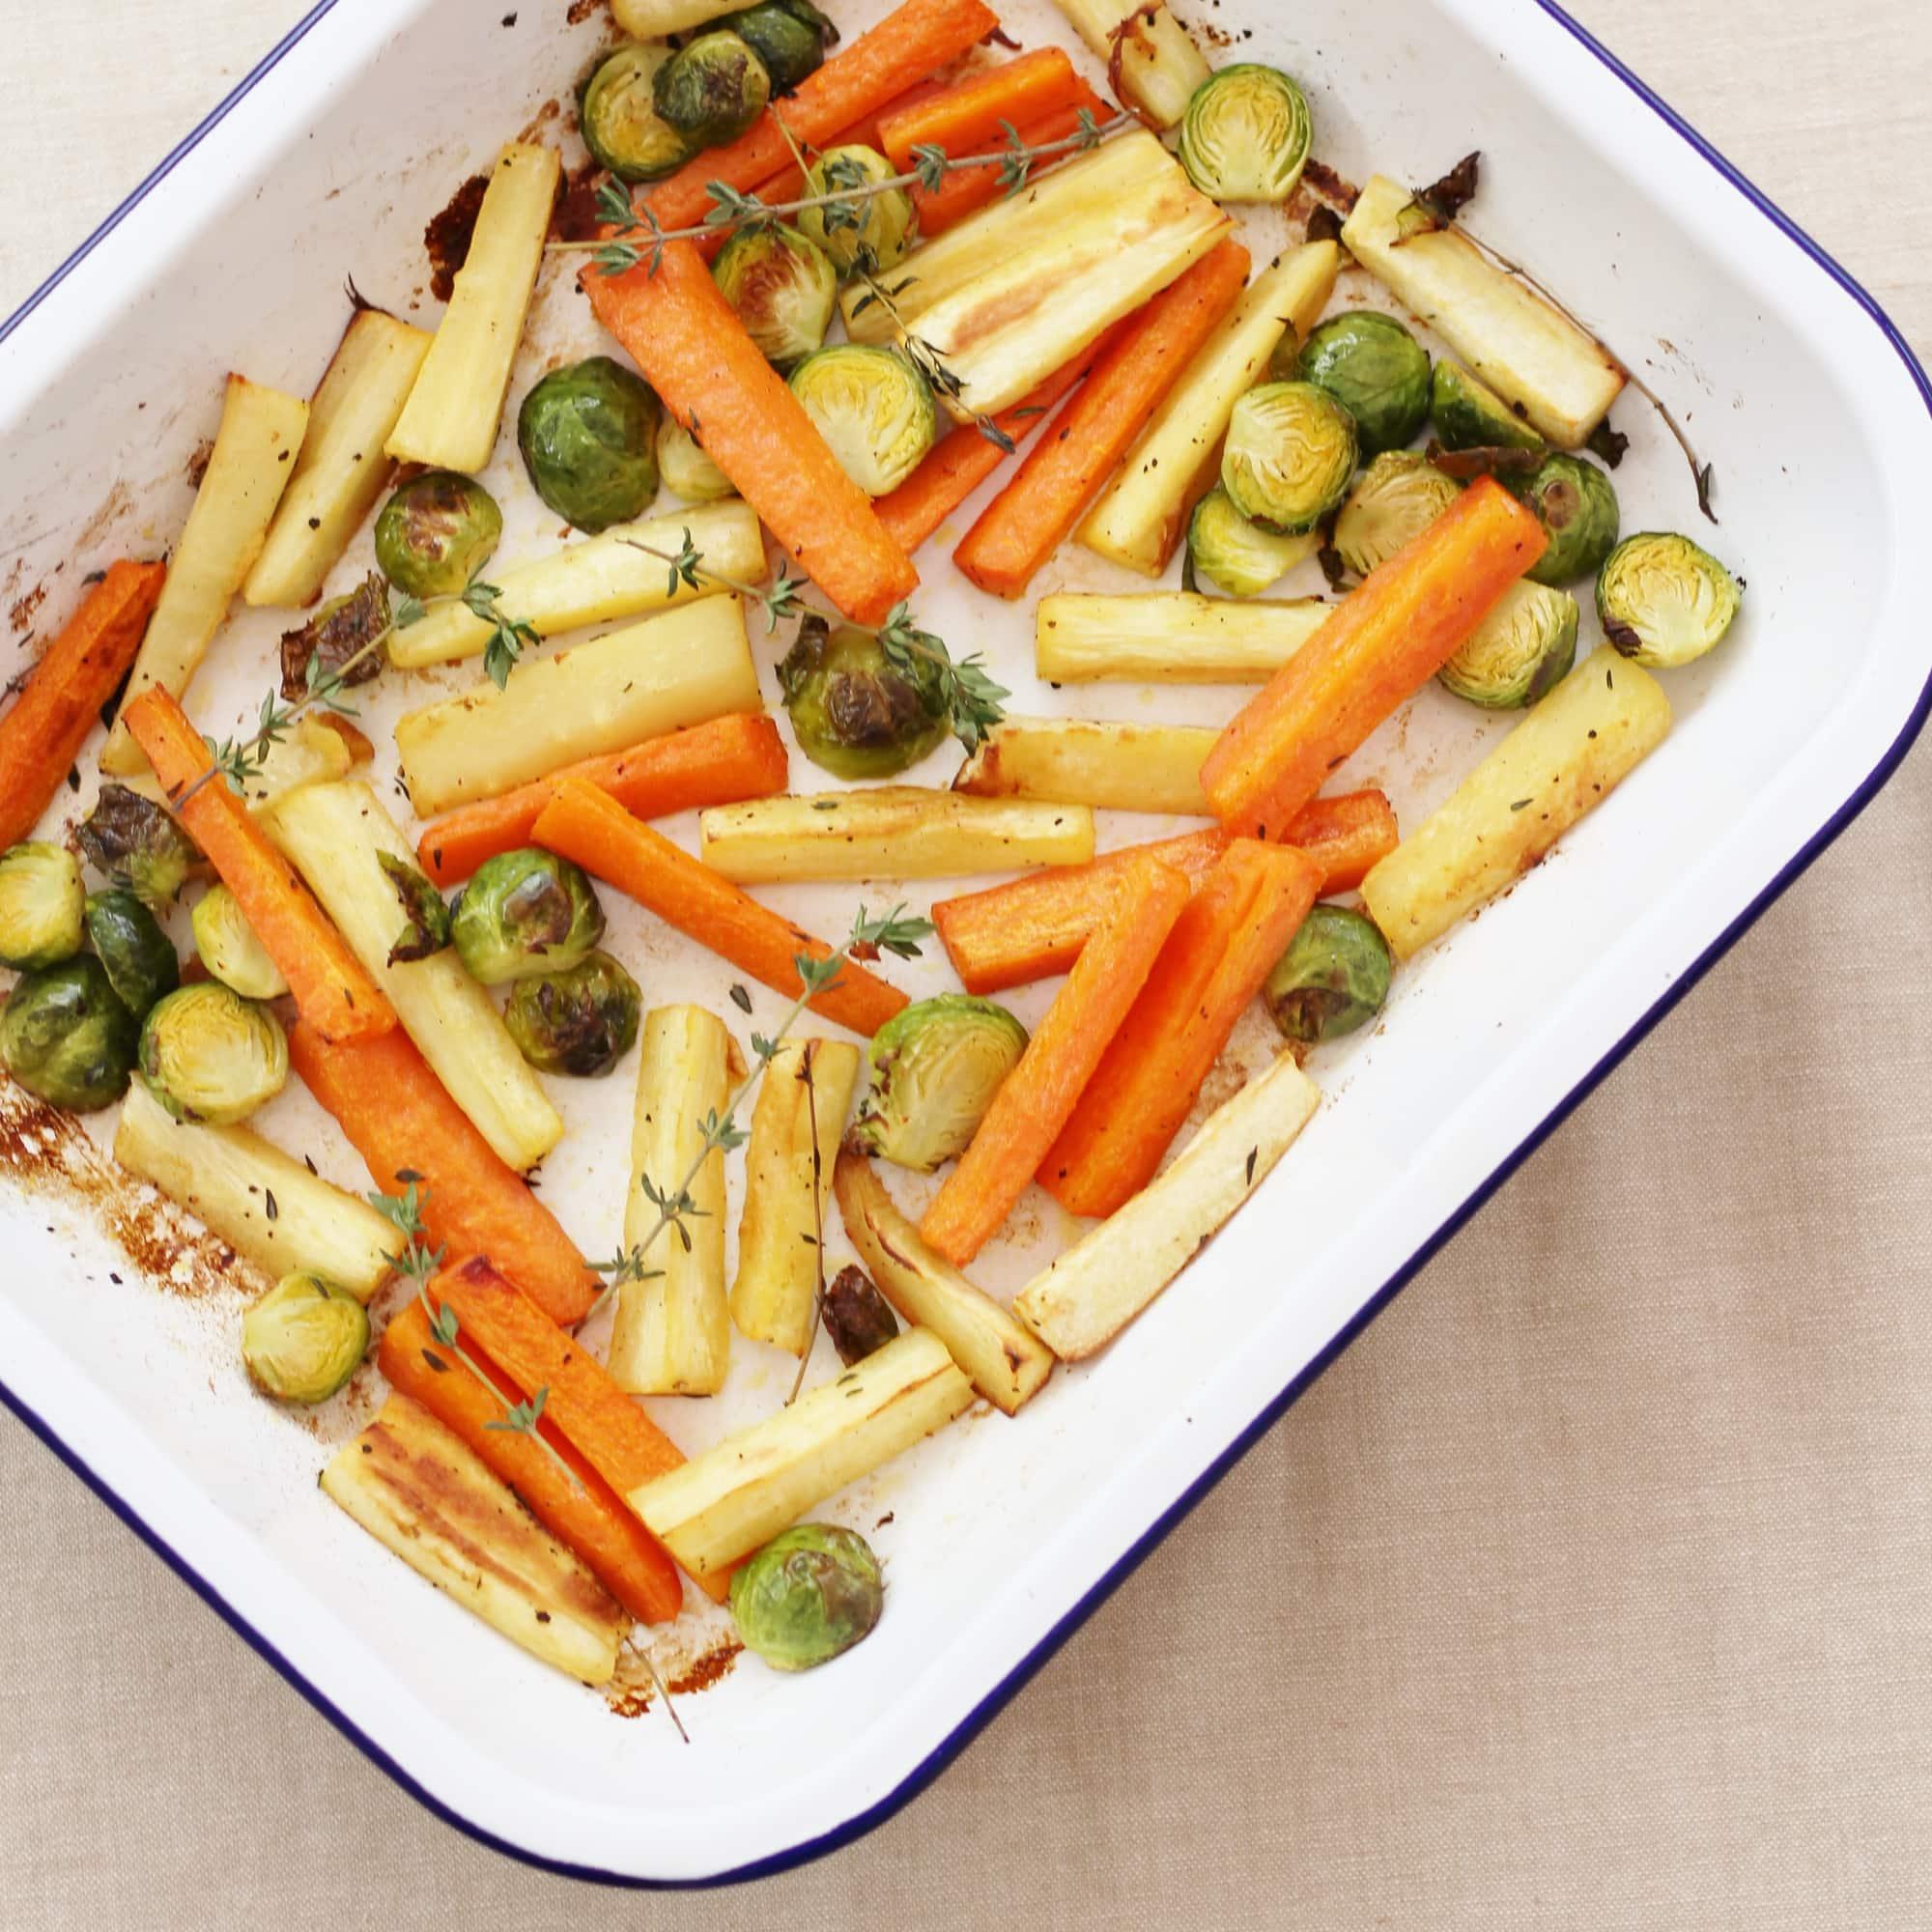 easy christmas vegetable traybake easy peasy foodie jpg 3456x3456 easy christmas veggie tray